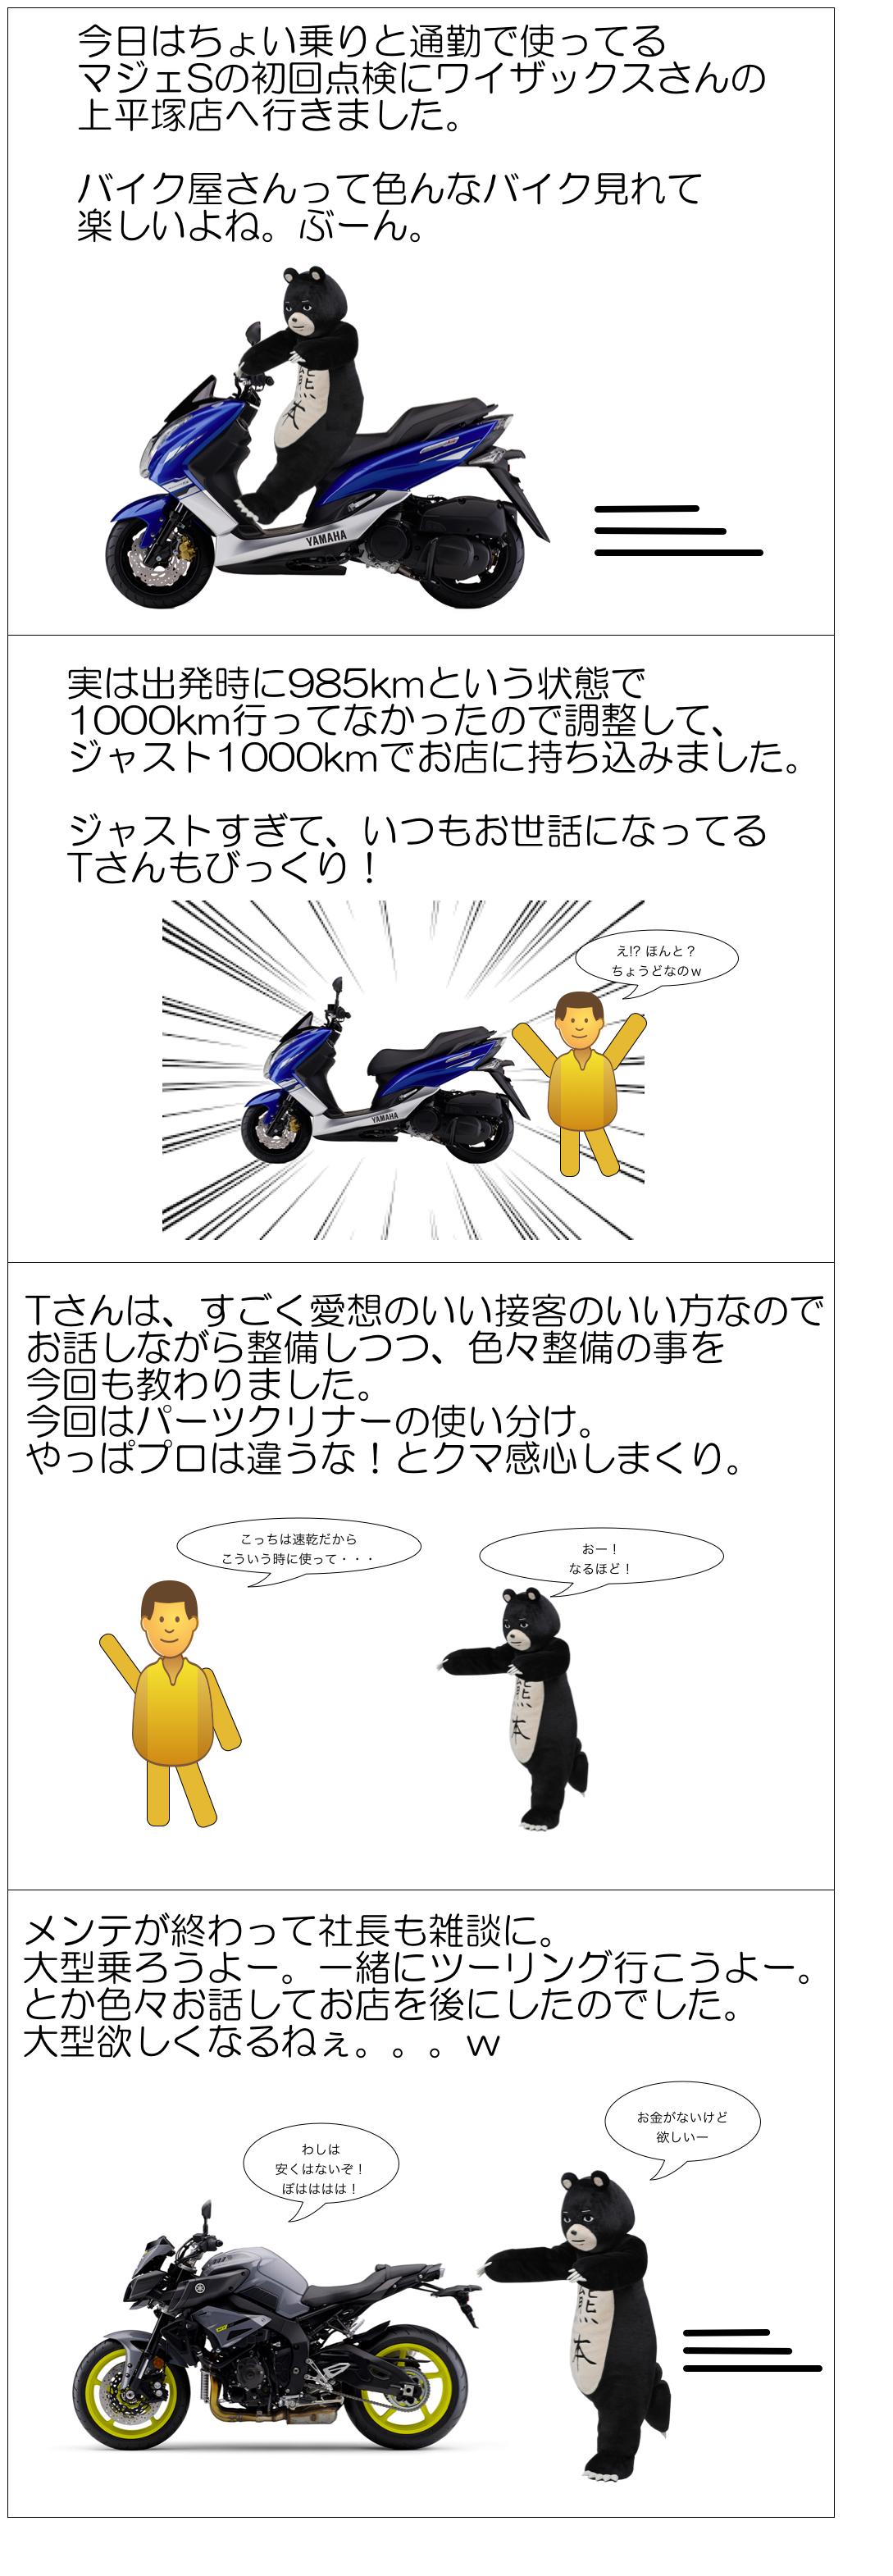 https://cdn-ak2.f.st-hatena.com/images/fotolife/k/kumagoro_bike/20170630/20170630210828_original.jpg